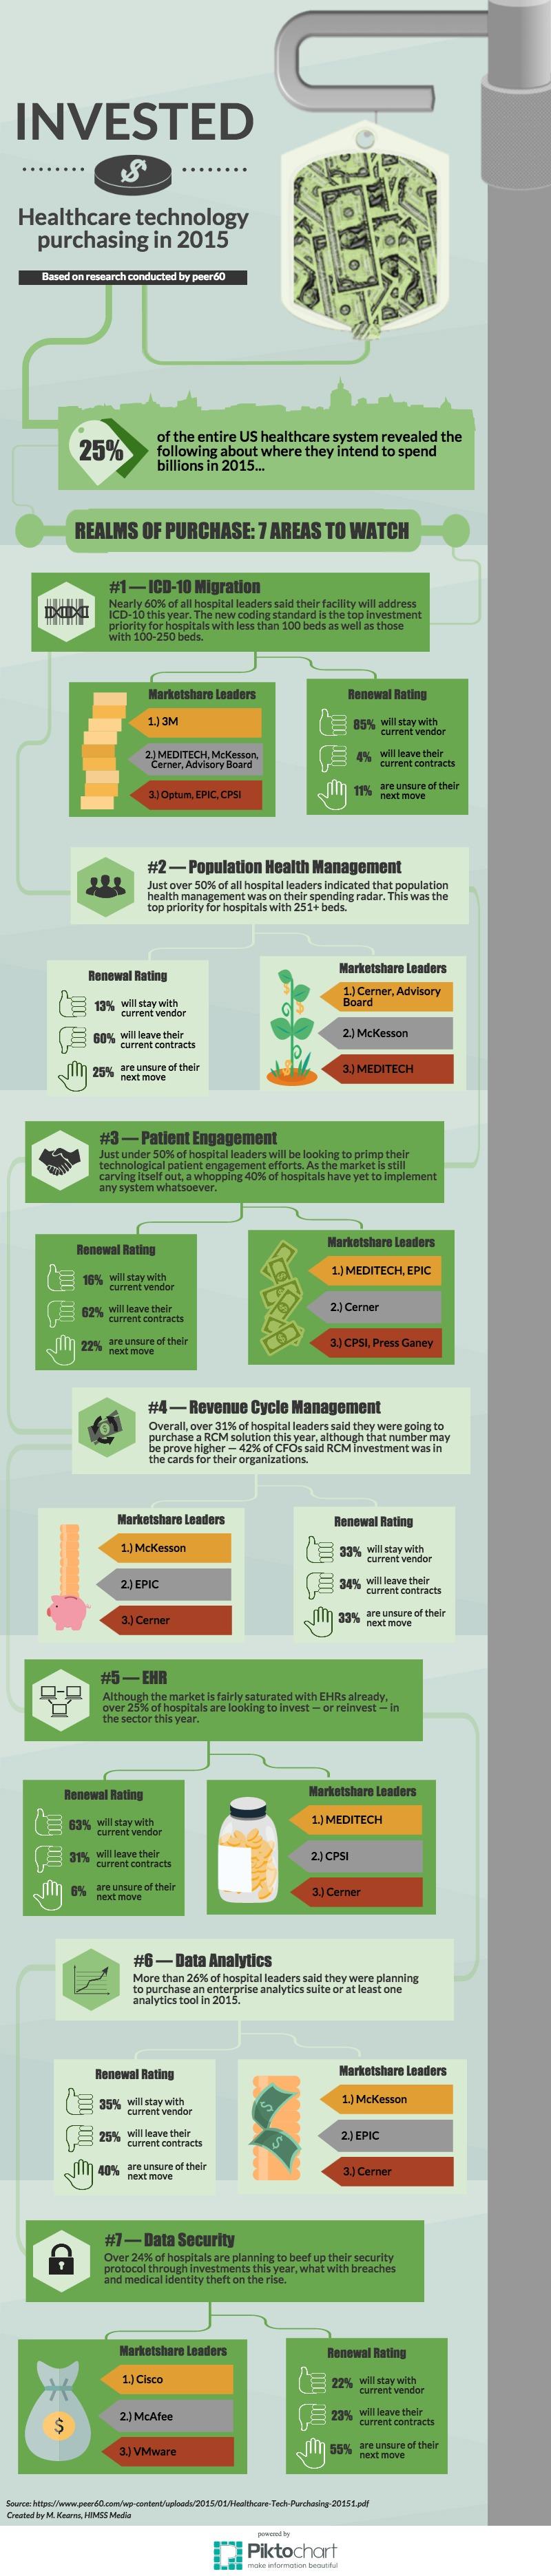 hitn_marketshare_infographic